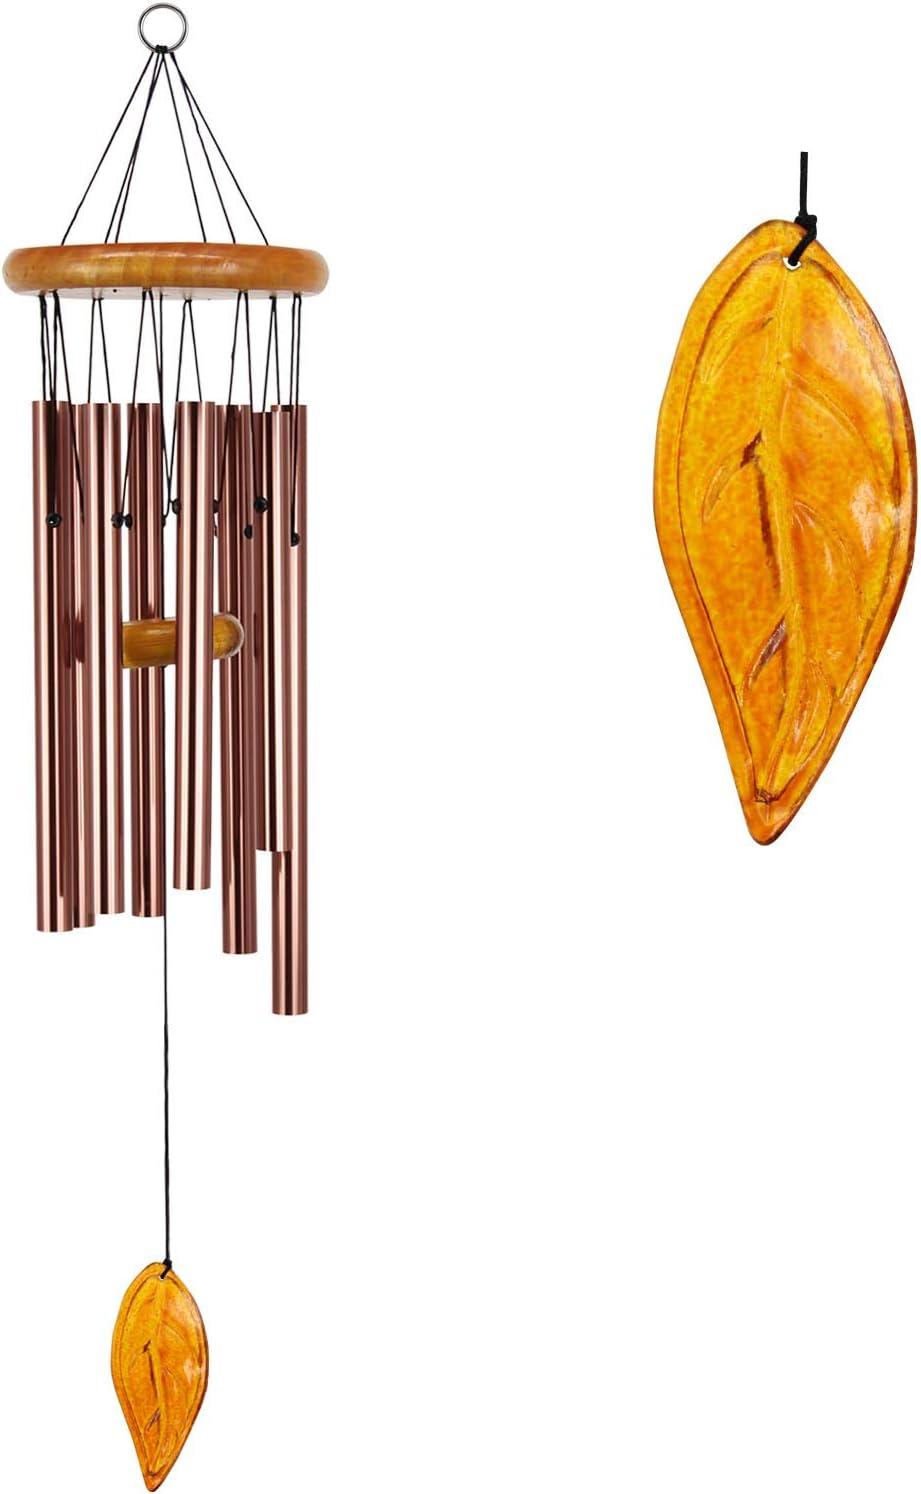 Astarin Wind Chimes Outdoor Deep Tone|30 Inch Sympathy Wind Chim